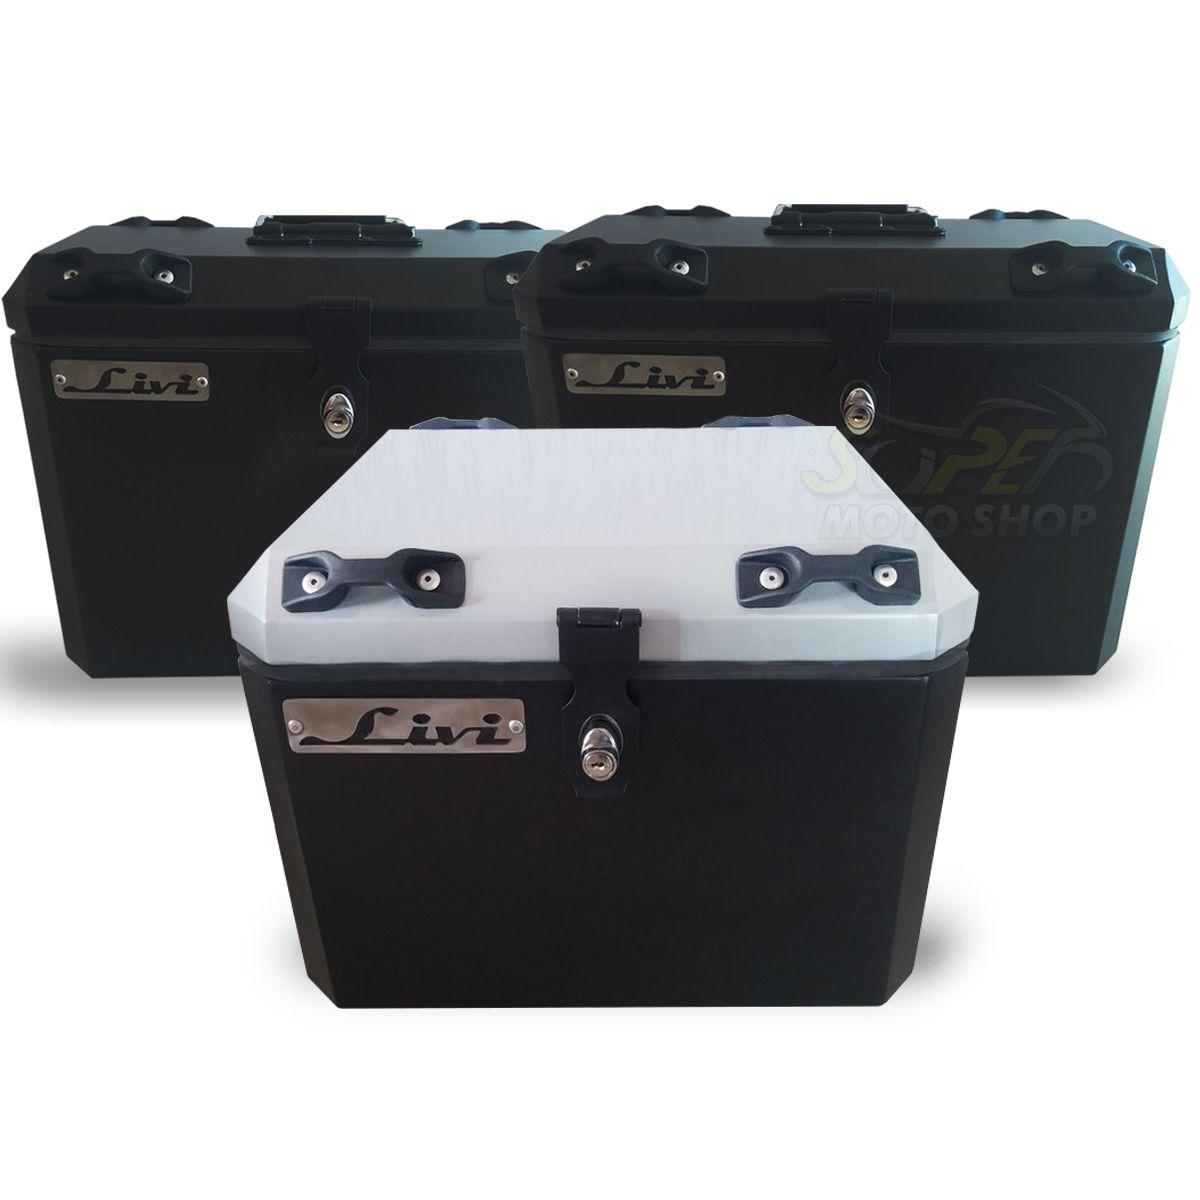 Kit Baú / Bauleto Alumínio Traseiro Top Case + Lateral Side Case + Suporte Para Baú de Alumínio Livi - Super Tenere 1200 - Yamaha